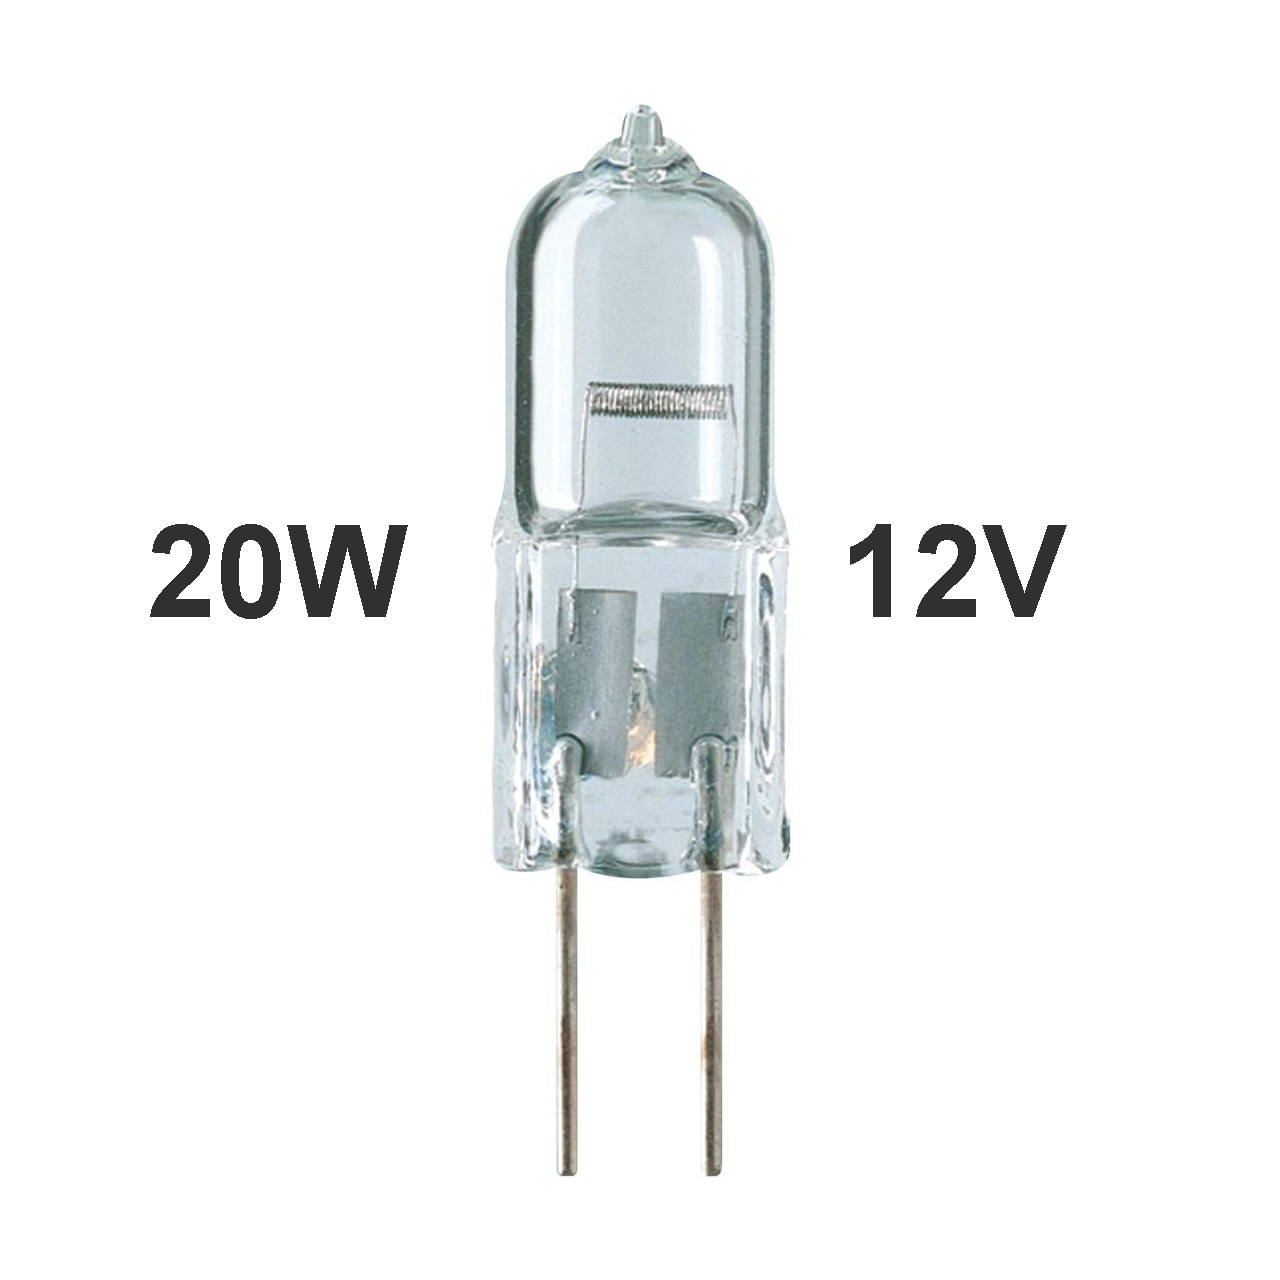 Brizzo Lighting Stores 10w Halogen G4 Bi Pin Bulb 12v Low